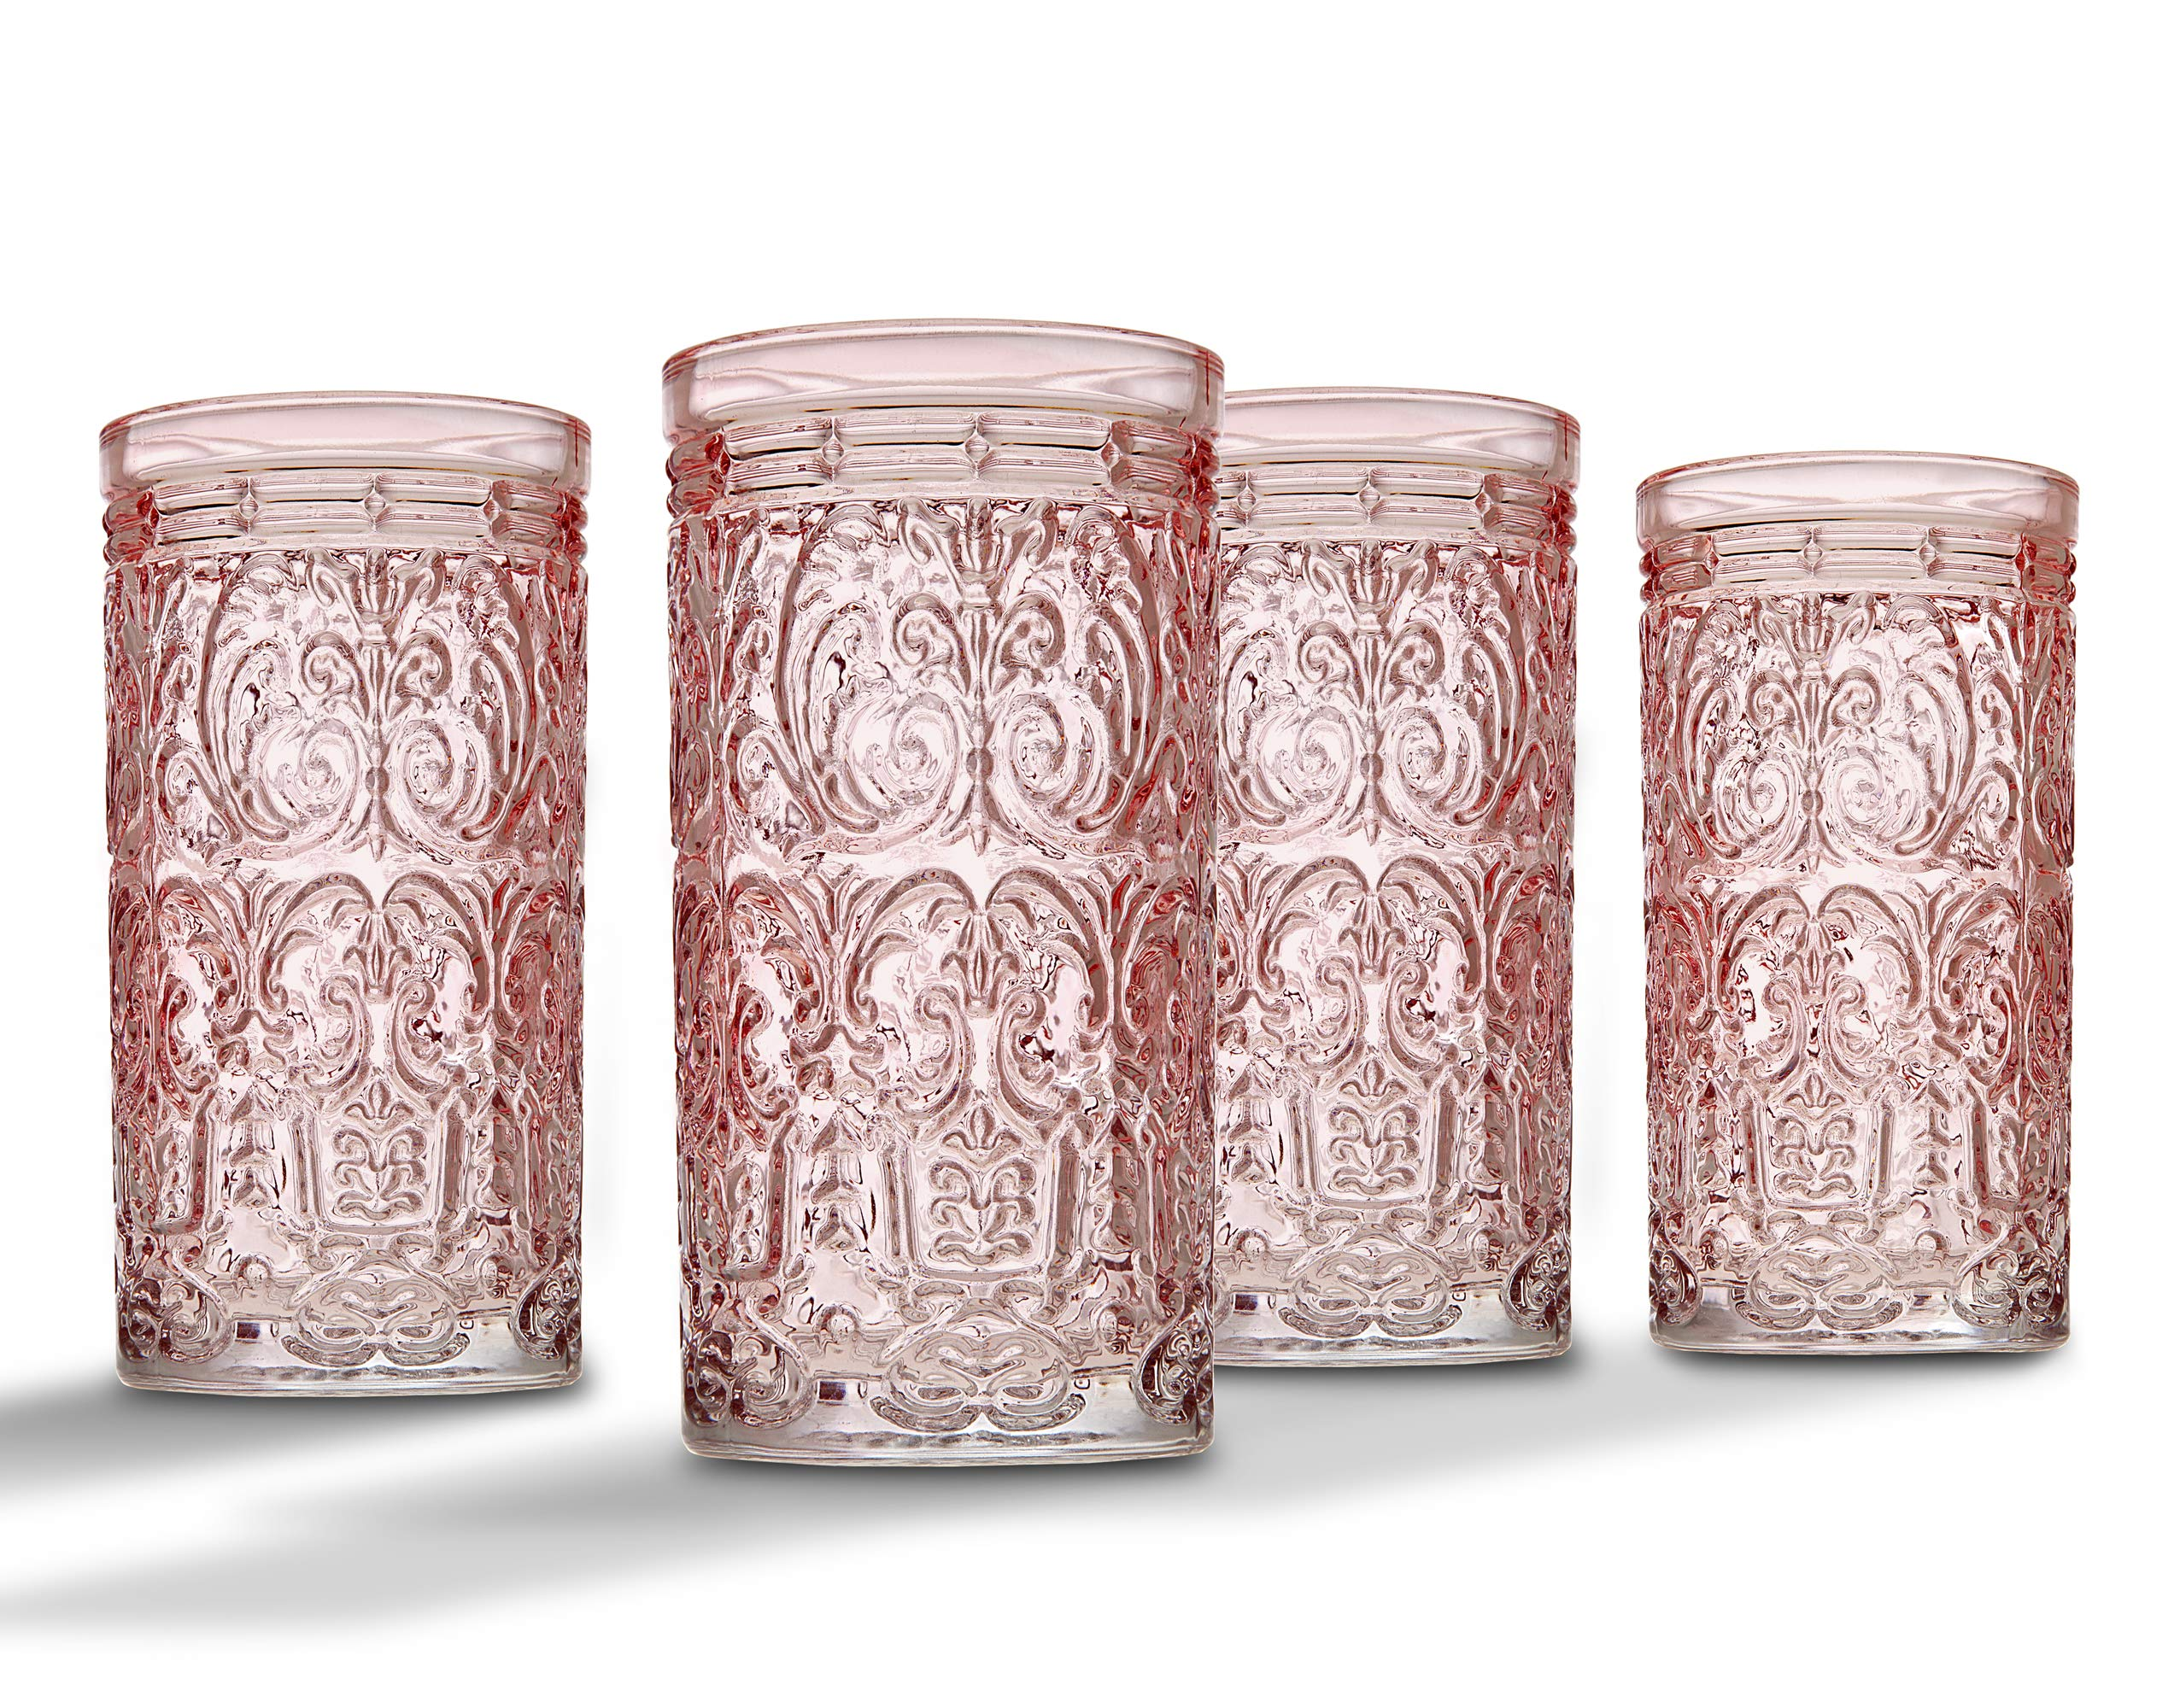 Jax Highball Beverage Glass Cup by Godinger – Pink – Set of 4